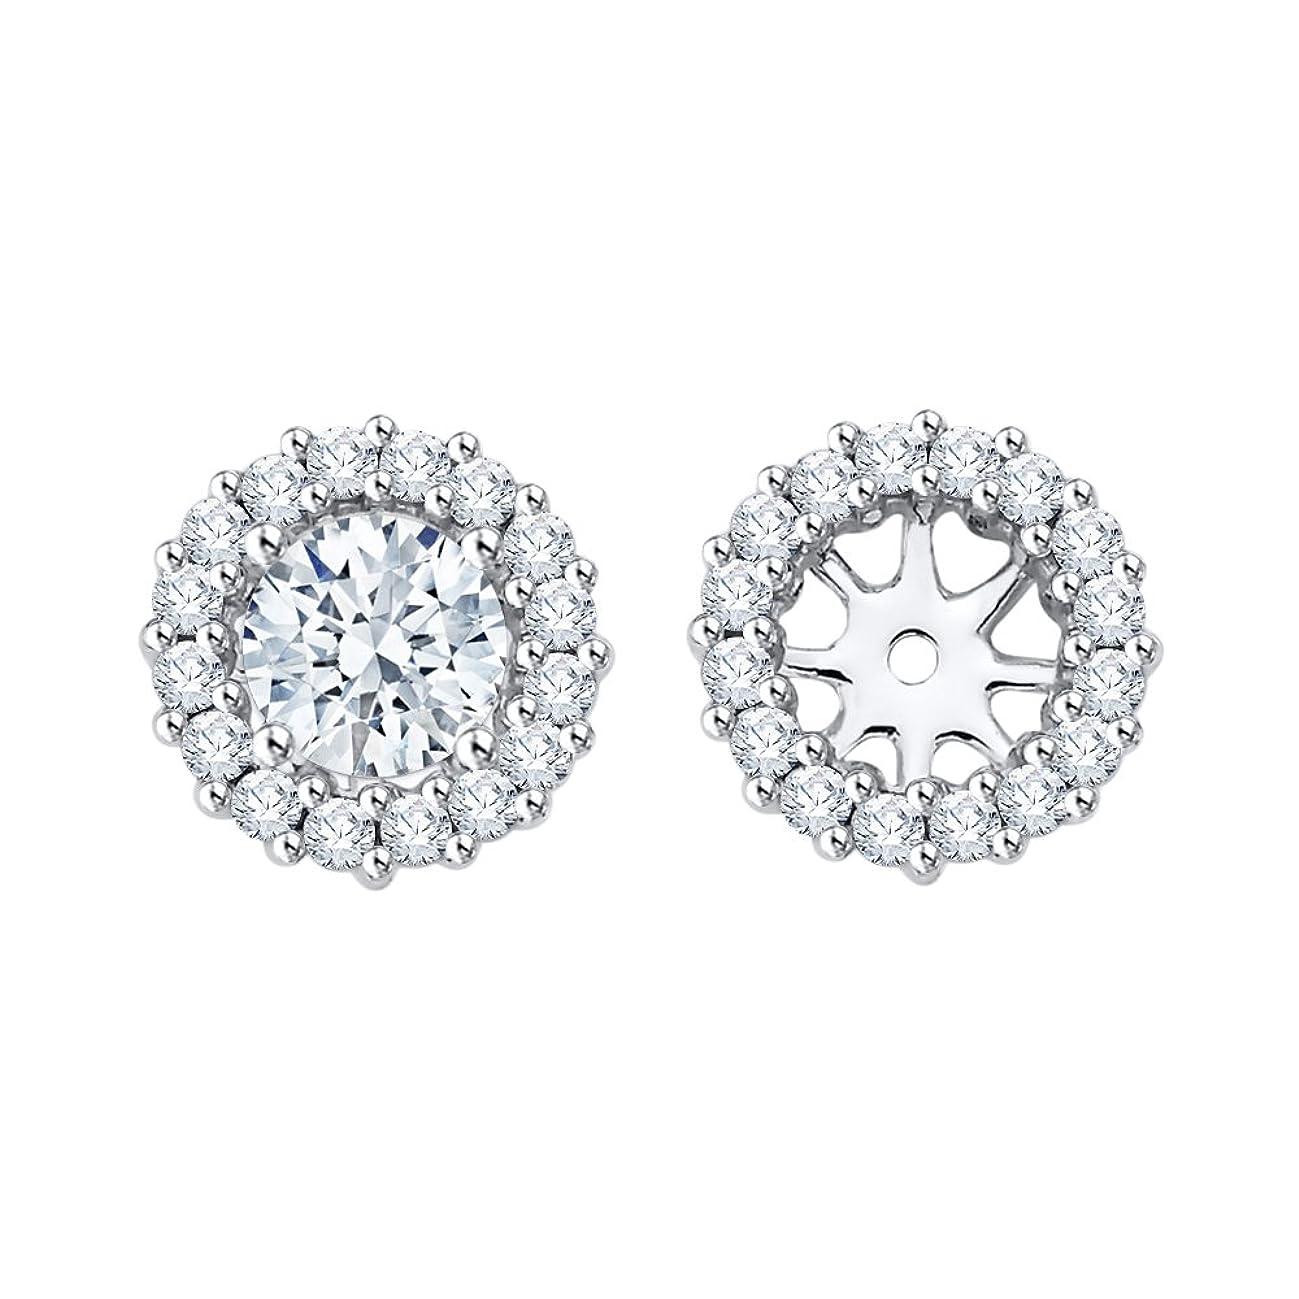 Diamond Earring Jackets in 14K Gold (1/2 cttw, G-H, I2-I3)